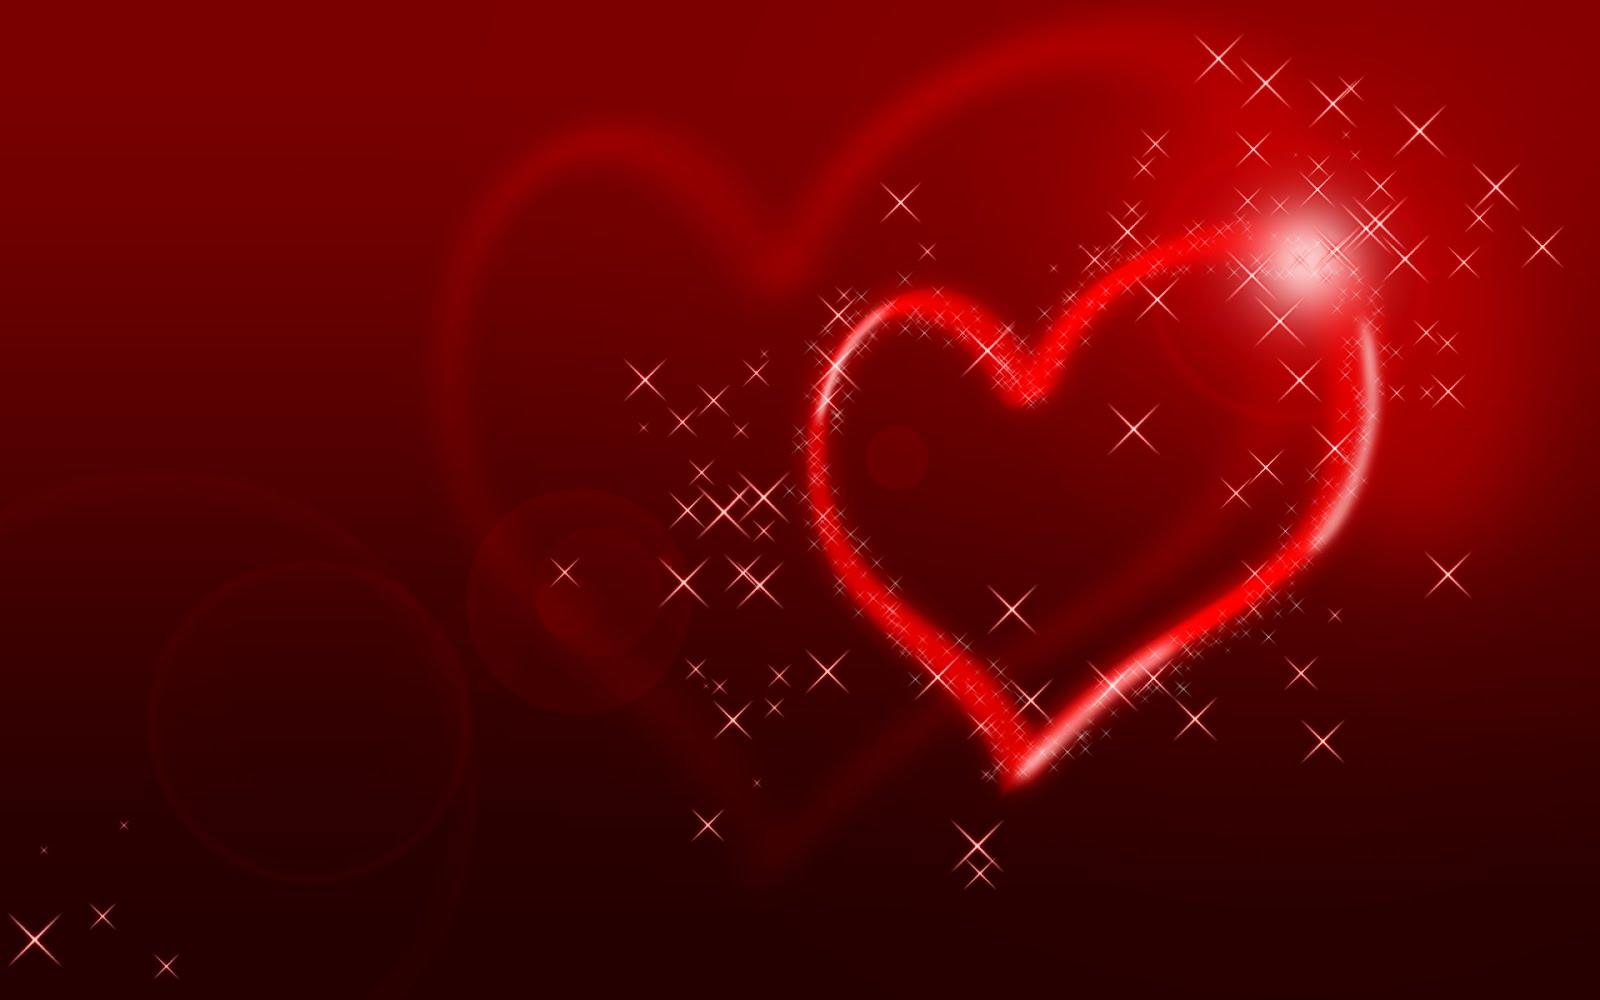 http://1.bp.blogspot.com/-vIY_e8lL9pA/TxfHy9tAzDI/AAAAAAAACko/woDG6W53Nos/s1600/HD-Heart-Wallpapers.jpg